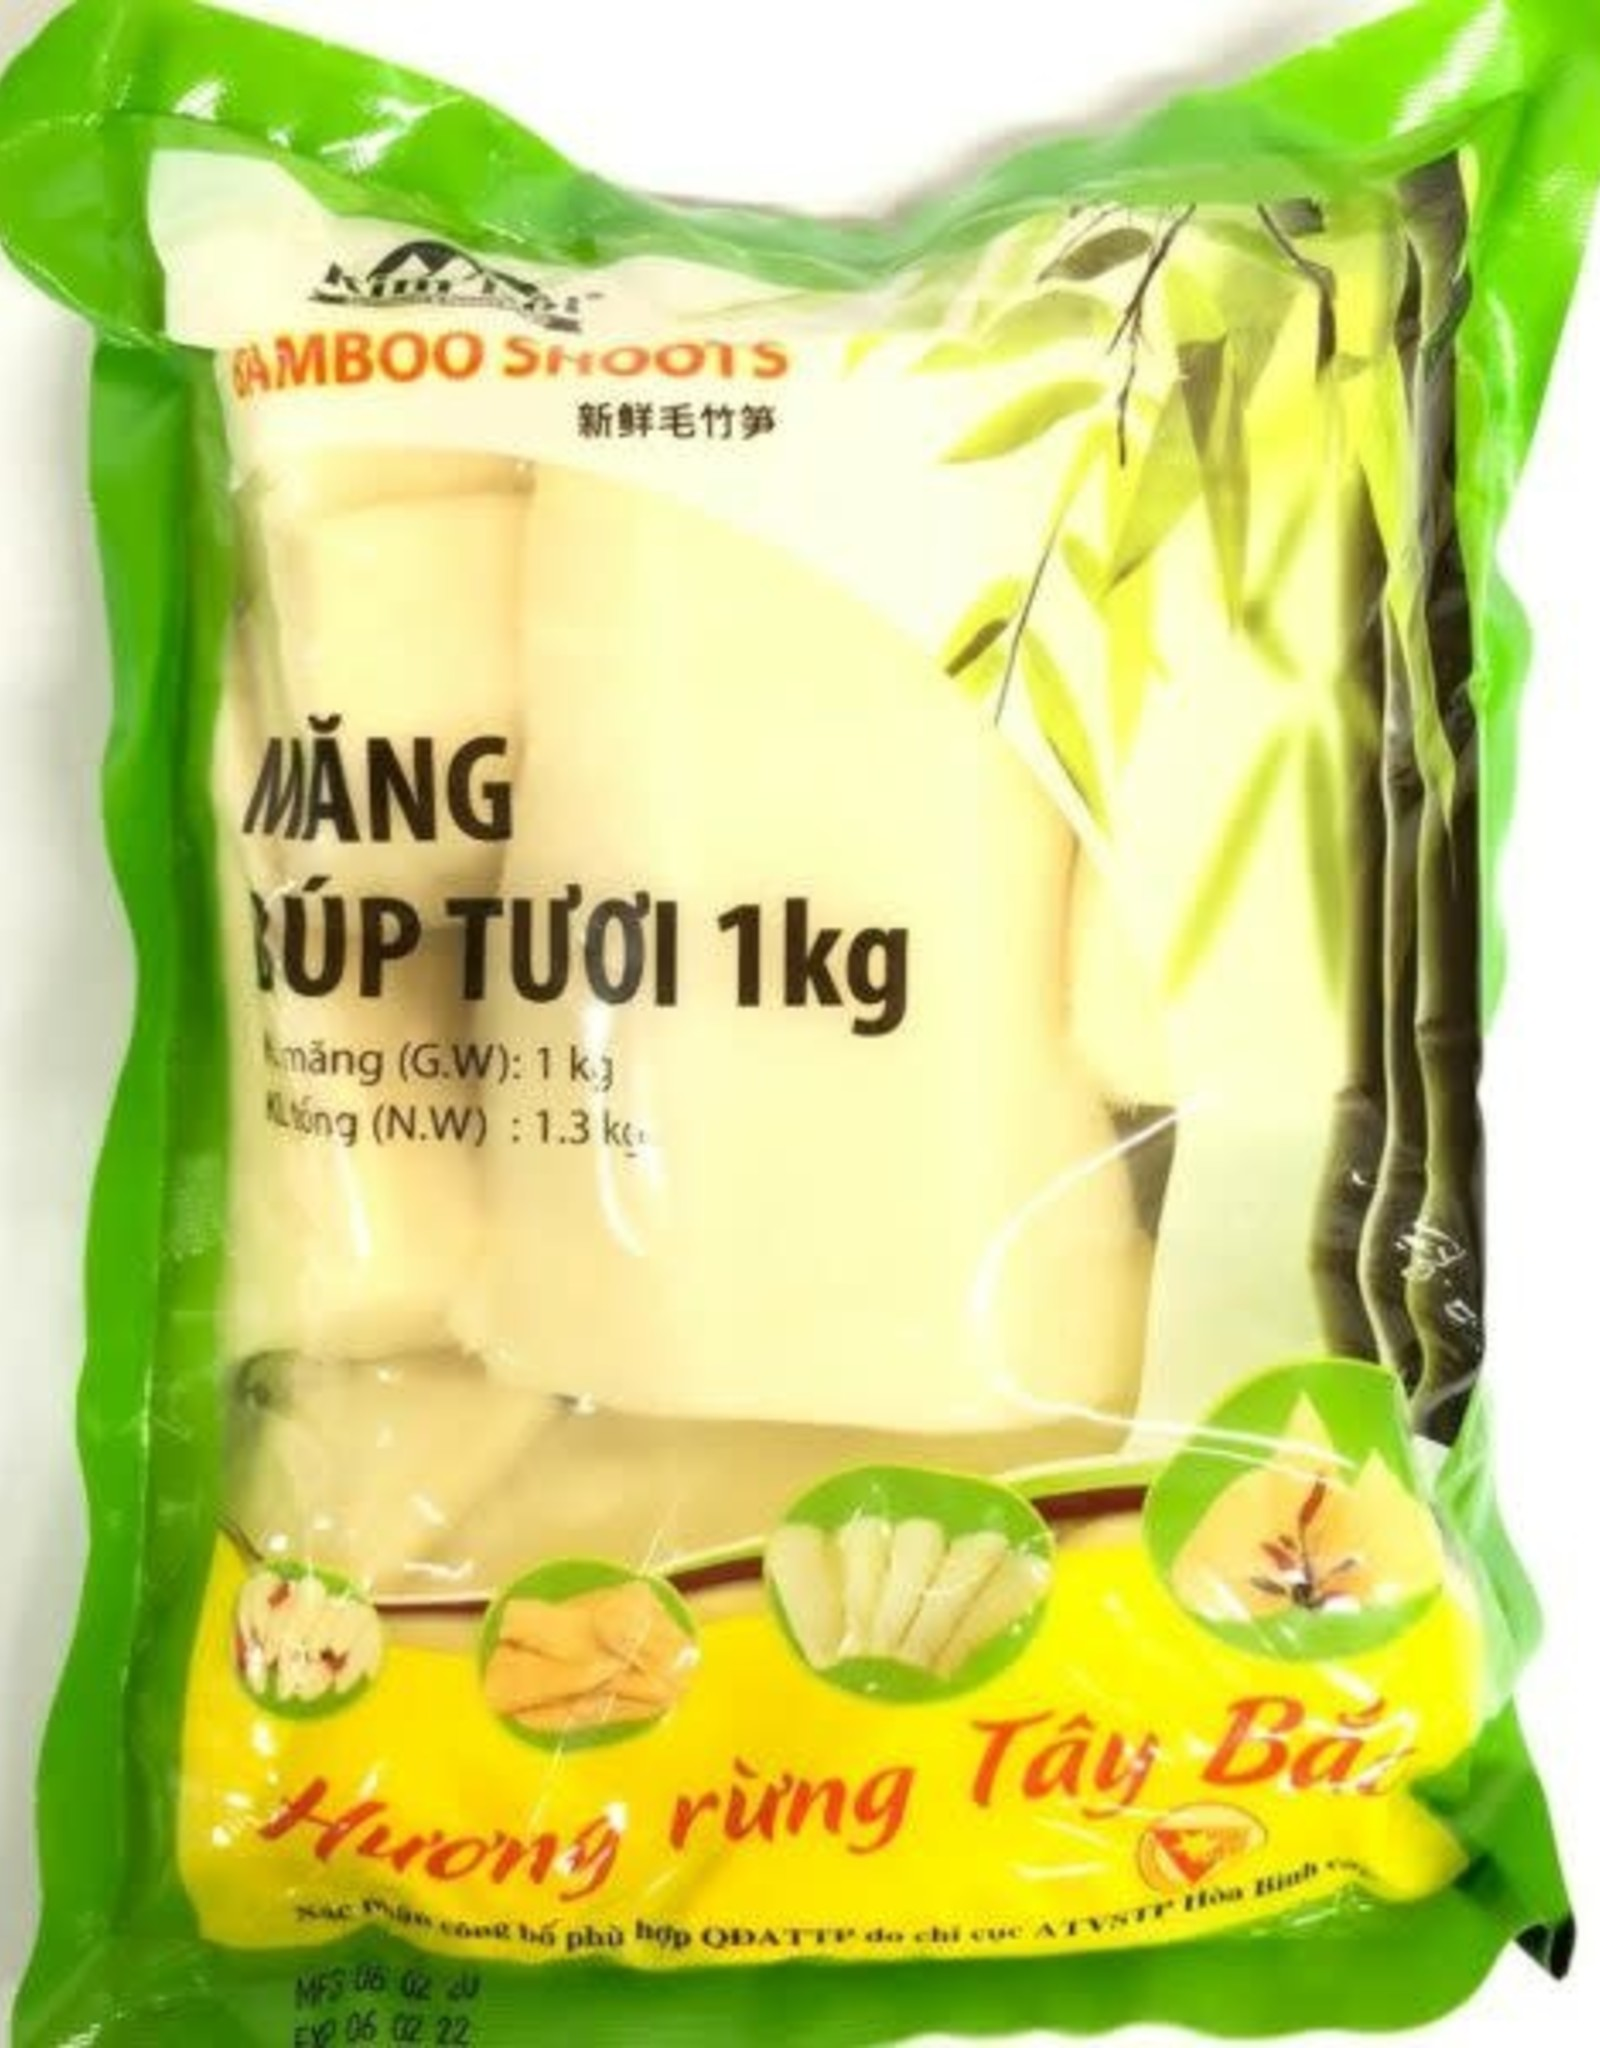 Voorgekookte Bup Bamboo Half 1000G